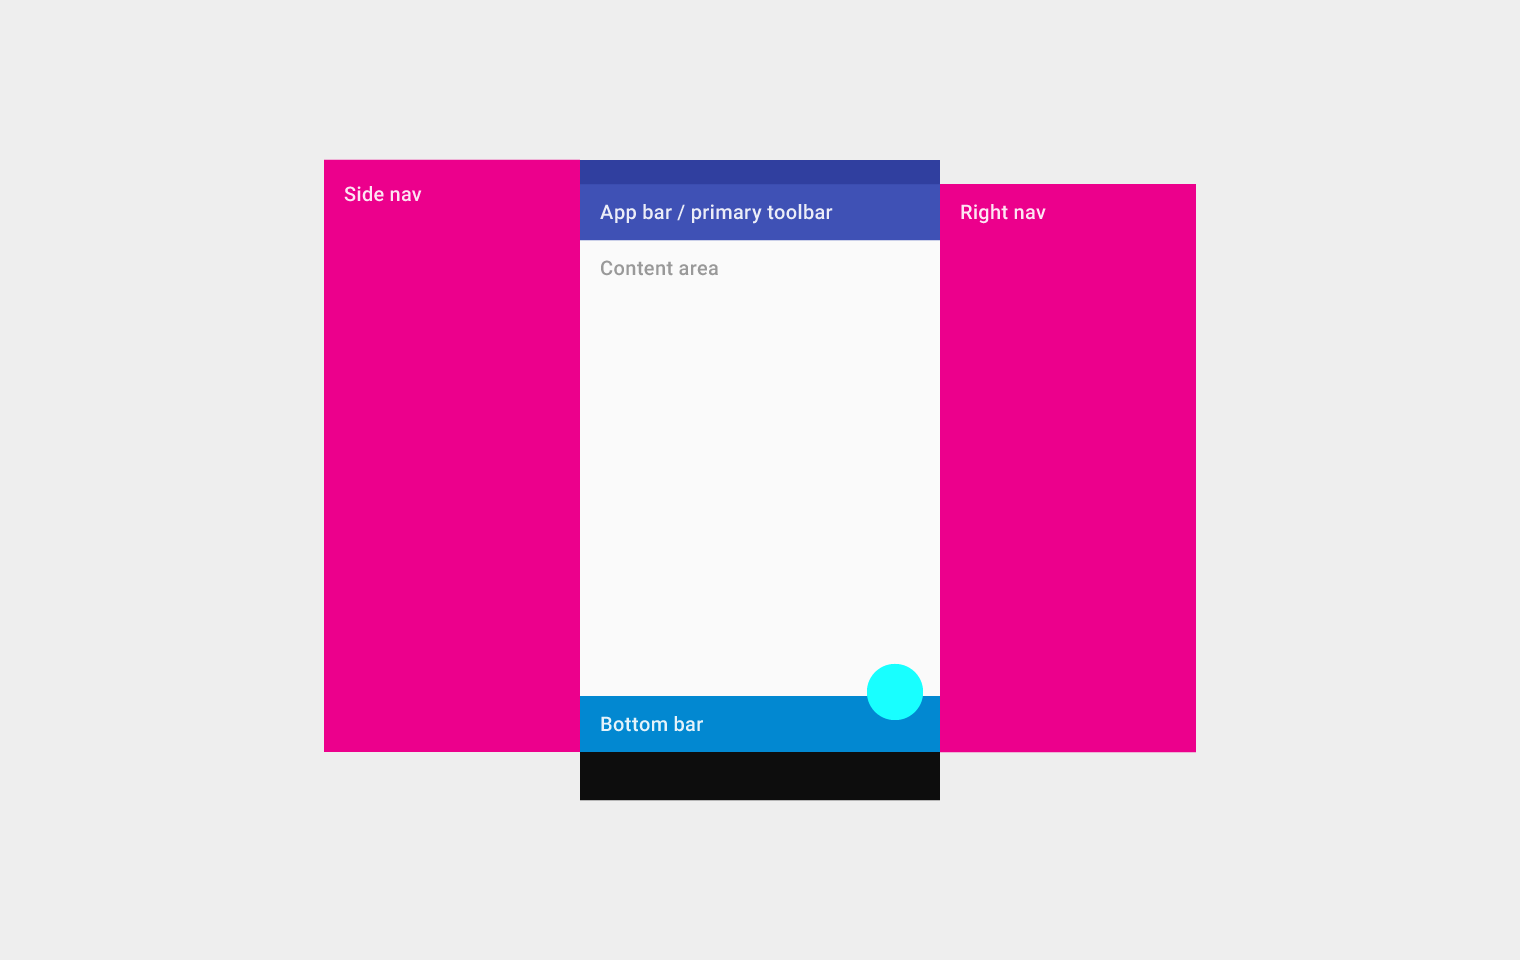 Android Navigation Bar Design Material